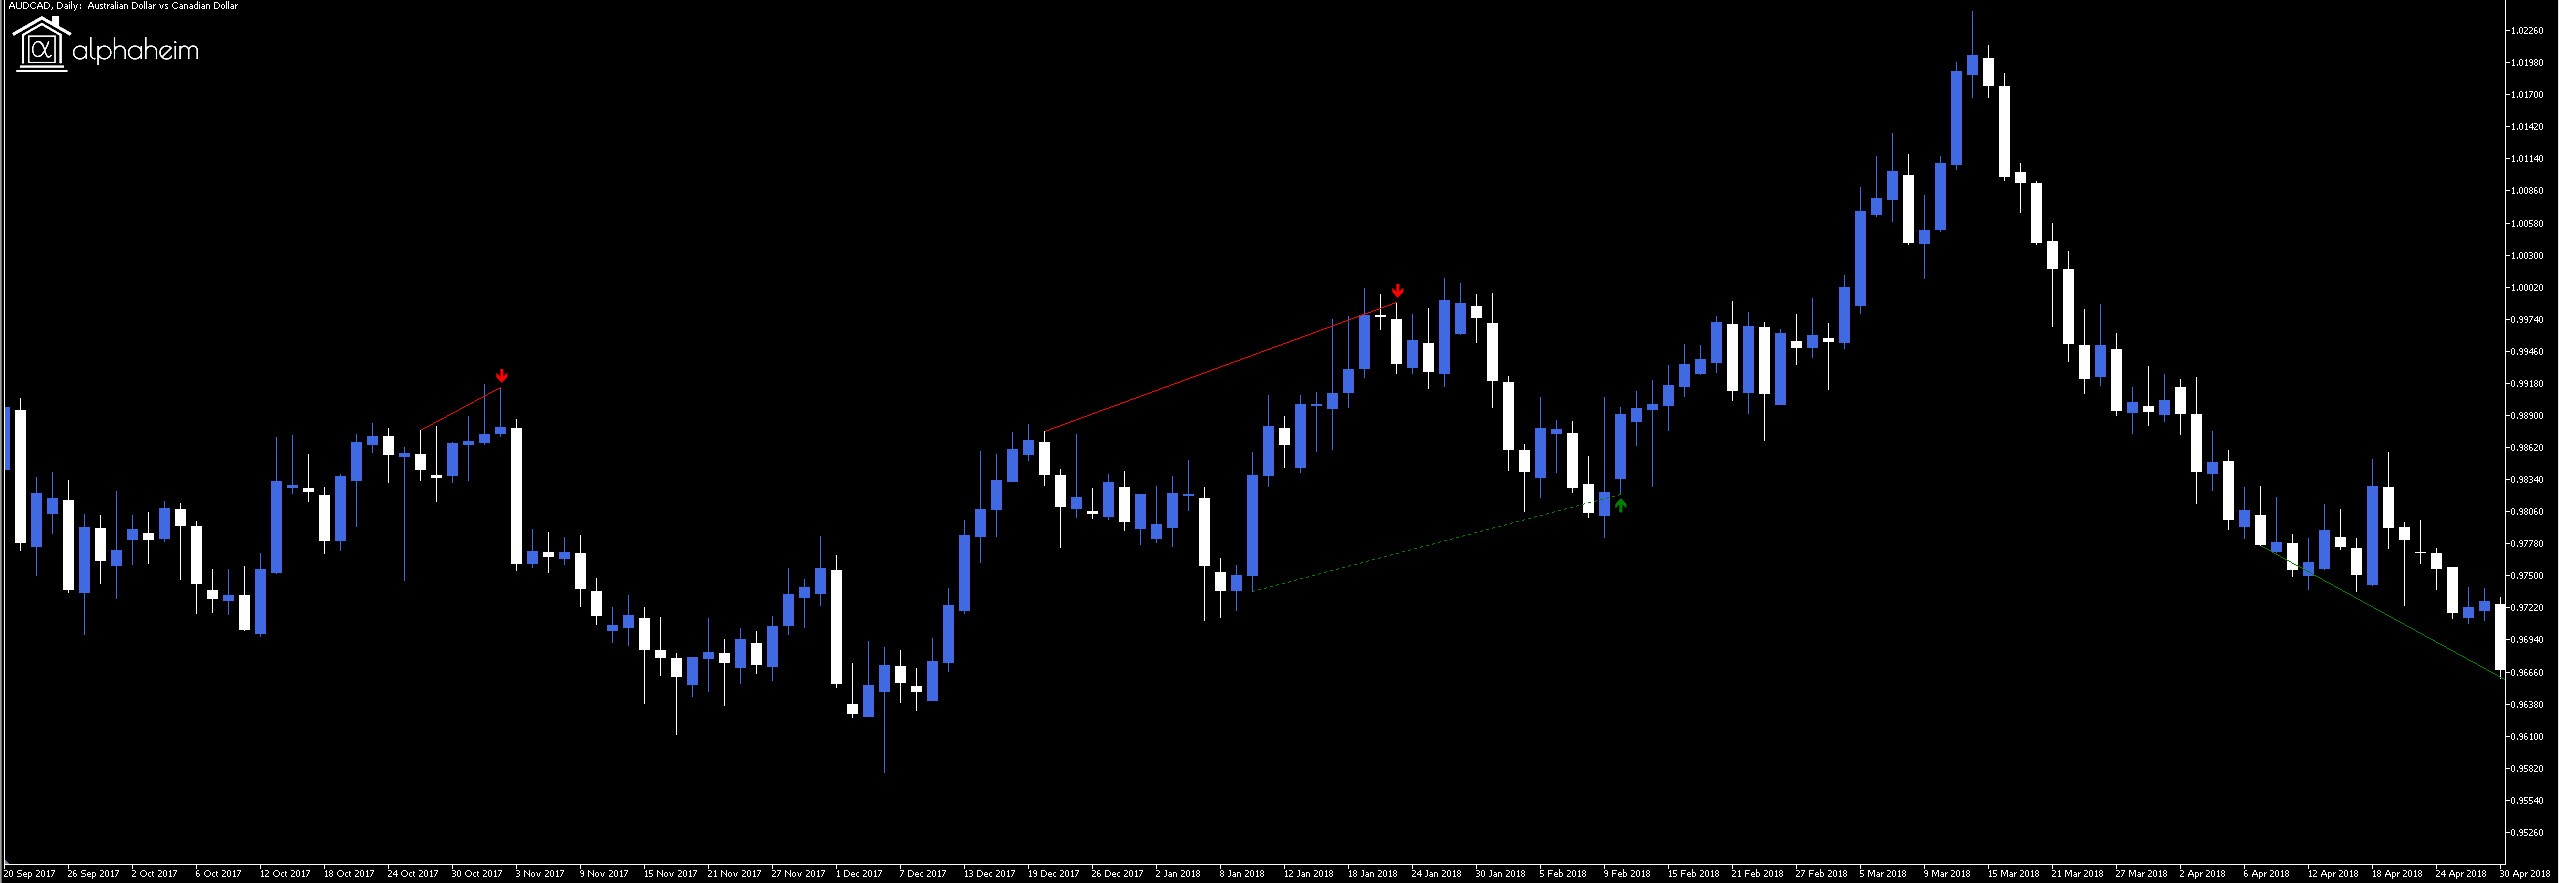 High Probability Forex Reversal Trading Trend Indicator For Metatrader 5 Metatrader 4